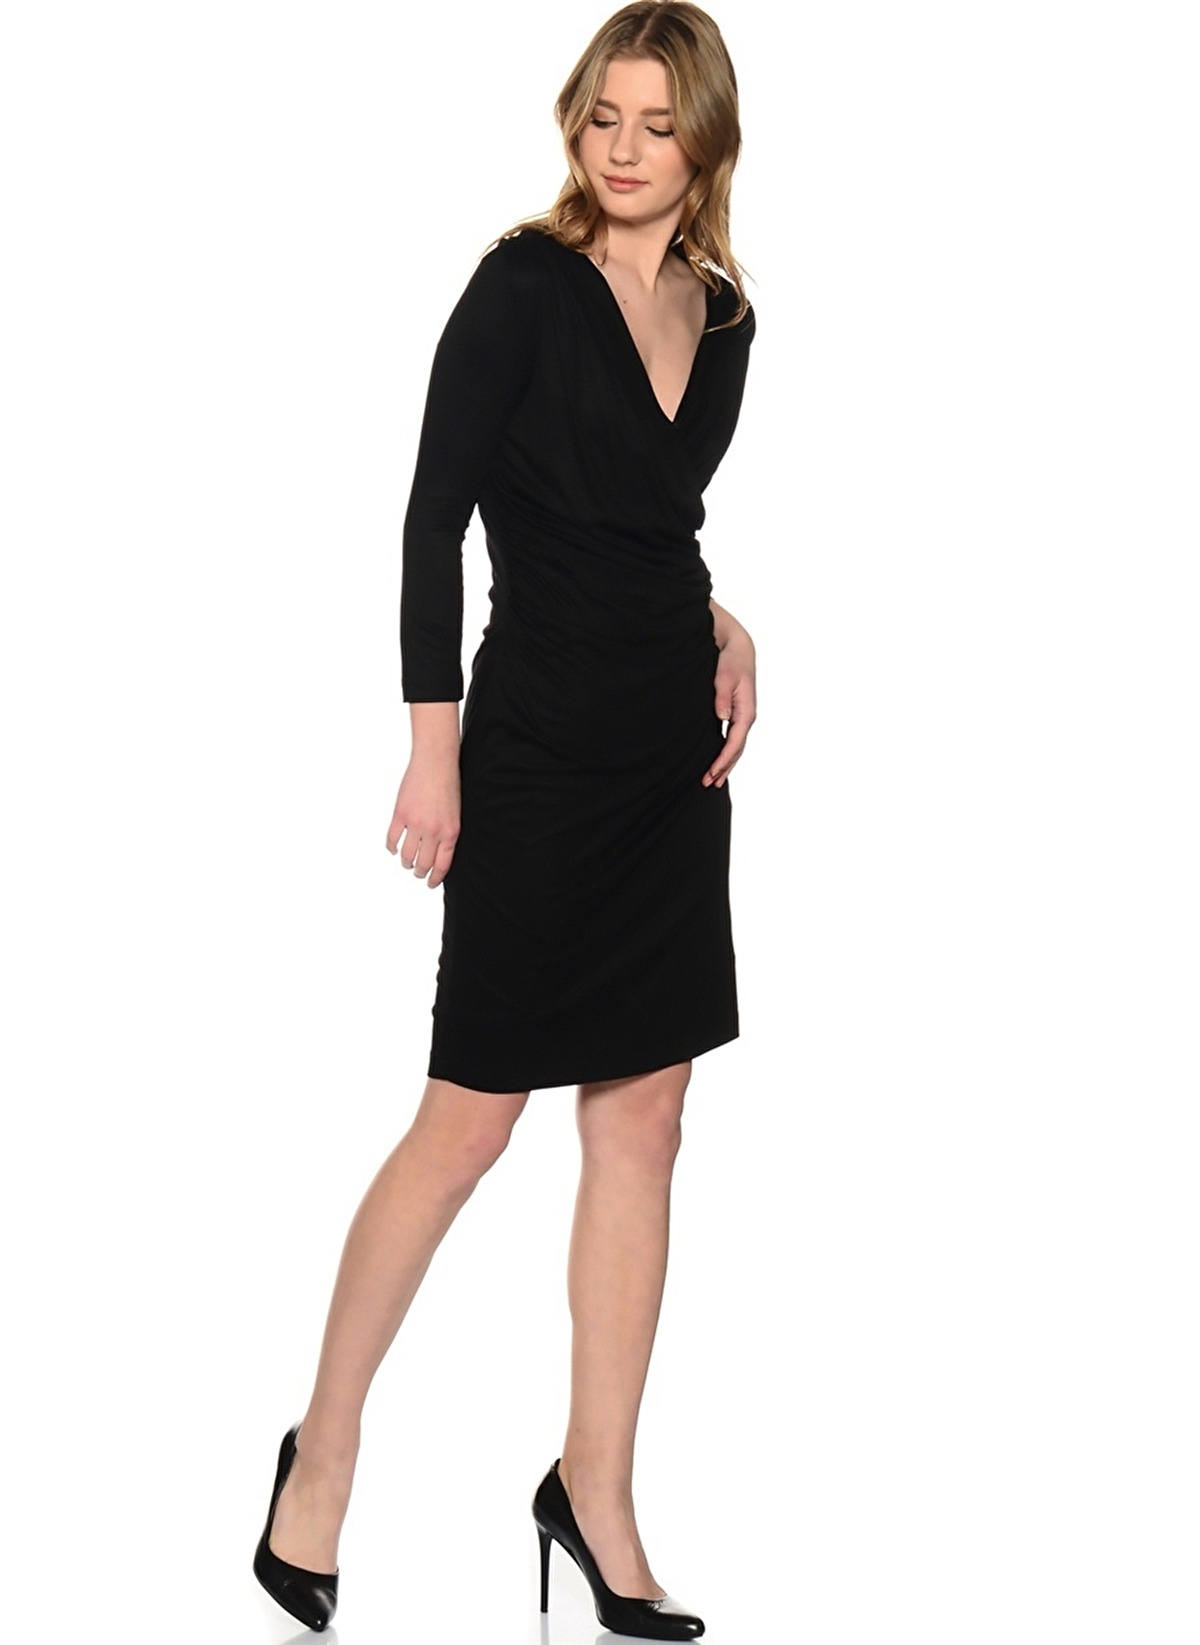 Fabrika Uzun Kollu V Yaka Elbise 520309518 K Elbise – 99.95 TL